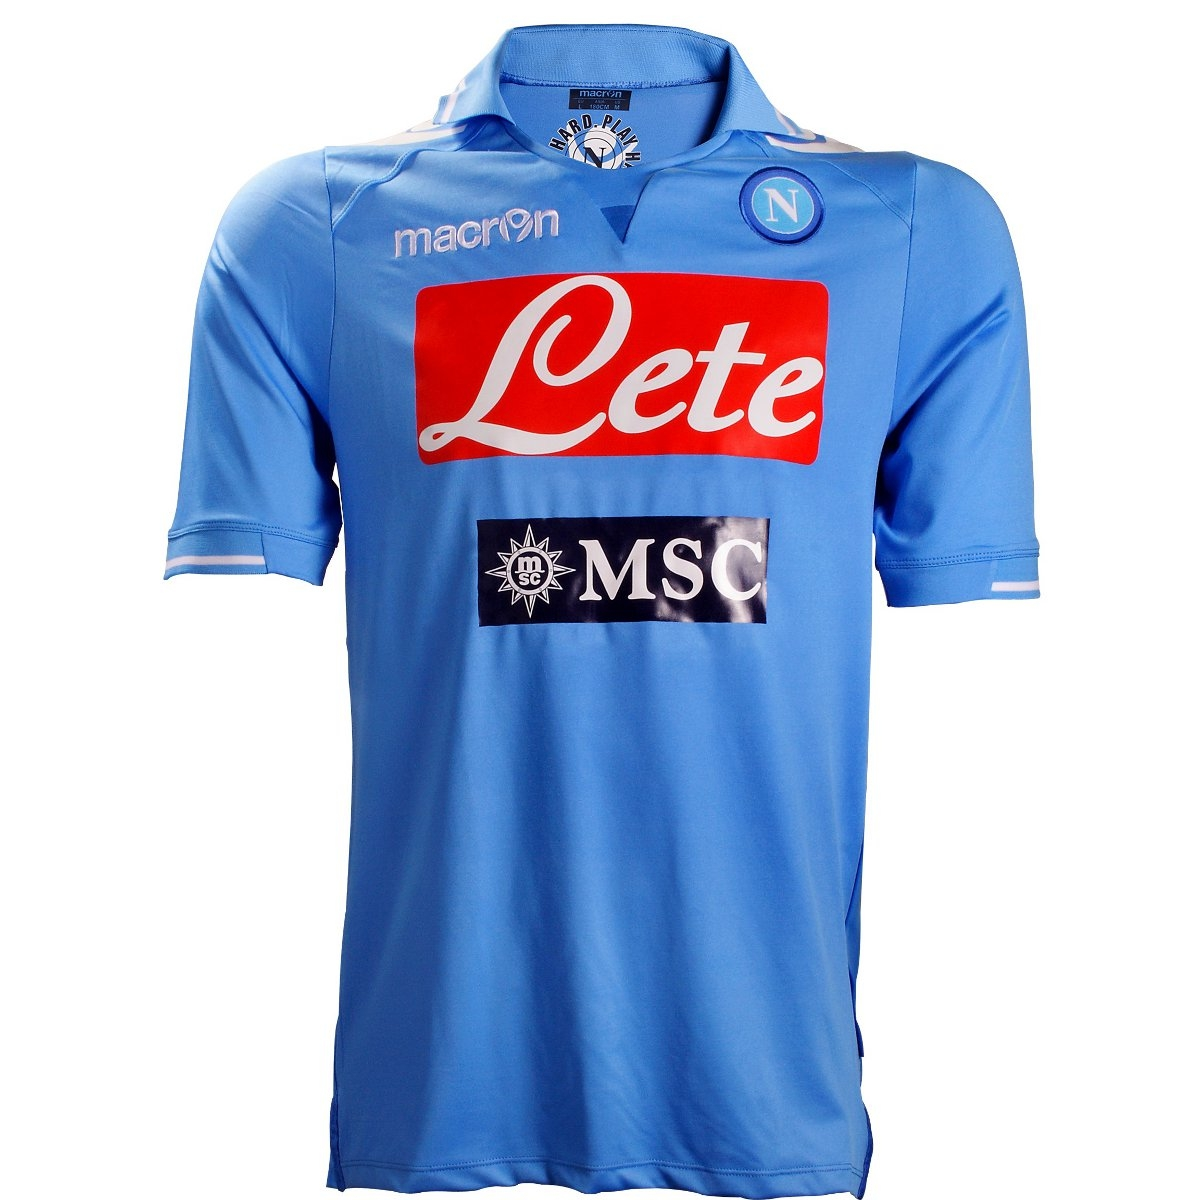 Equipaci  N   Uniforme   Camiseta N  Poles Napoli Azul 2011 2012